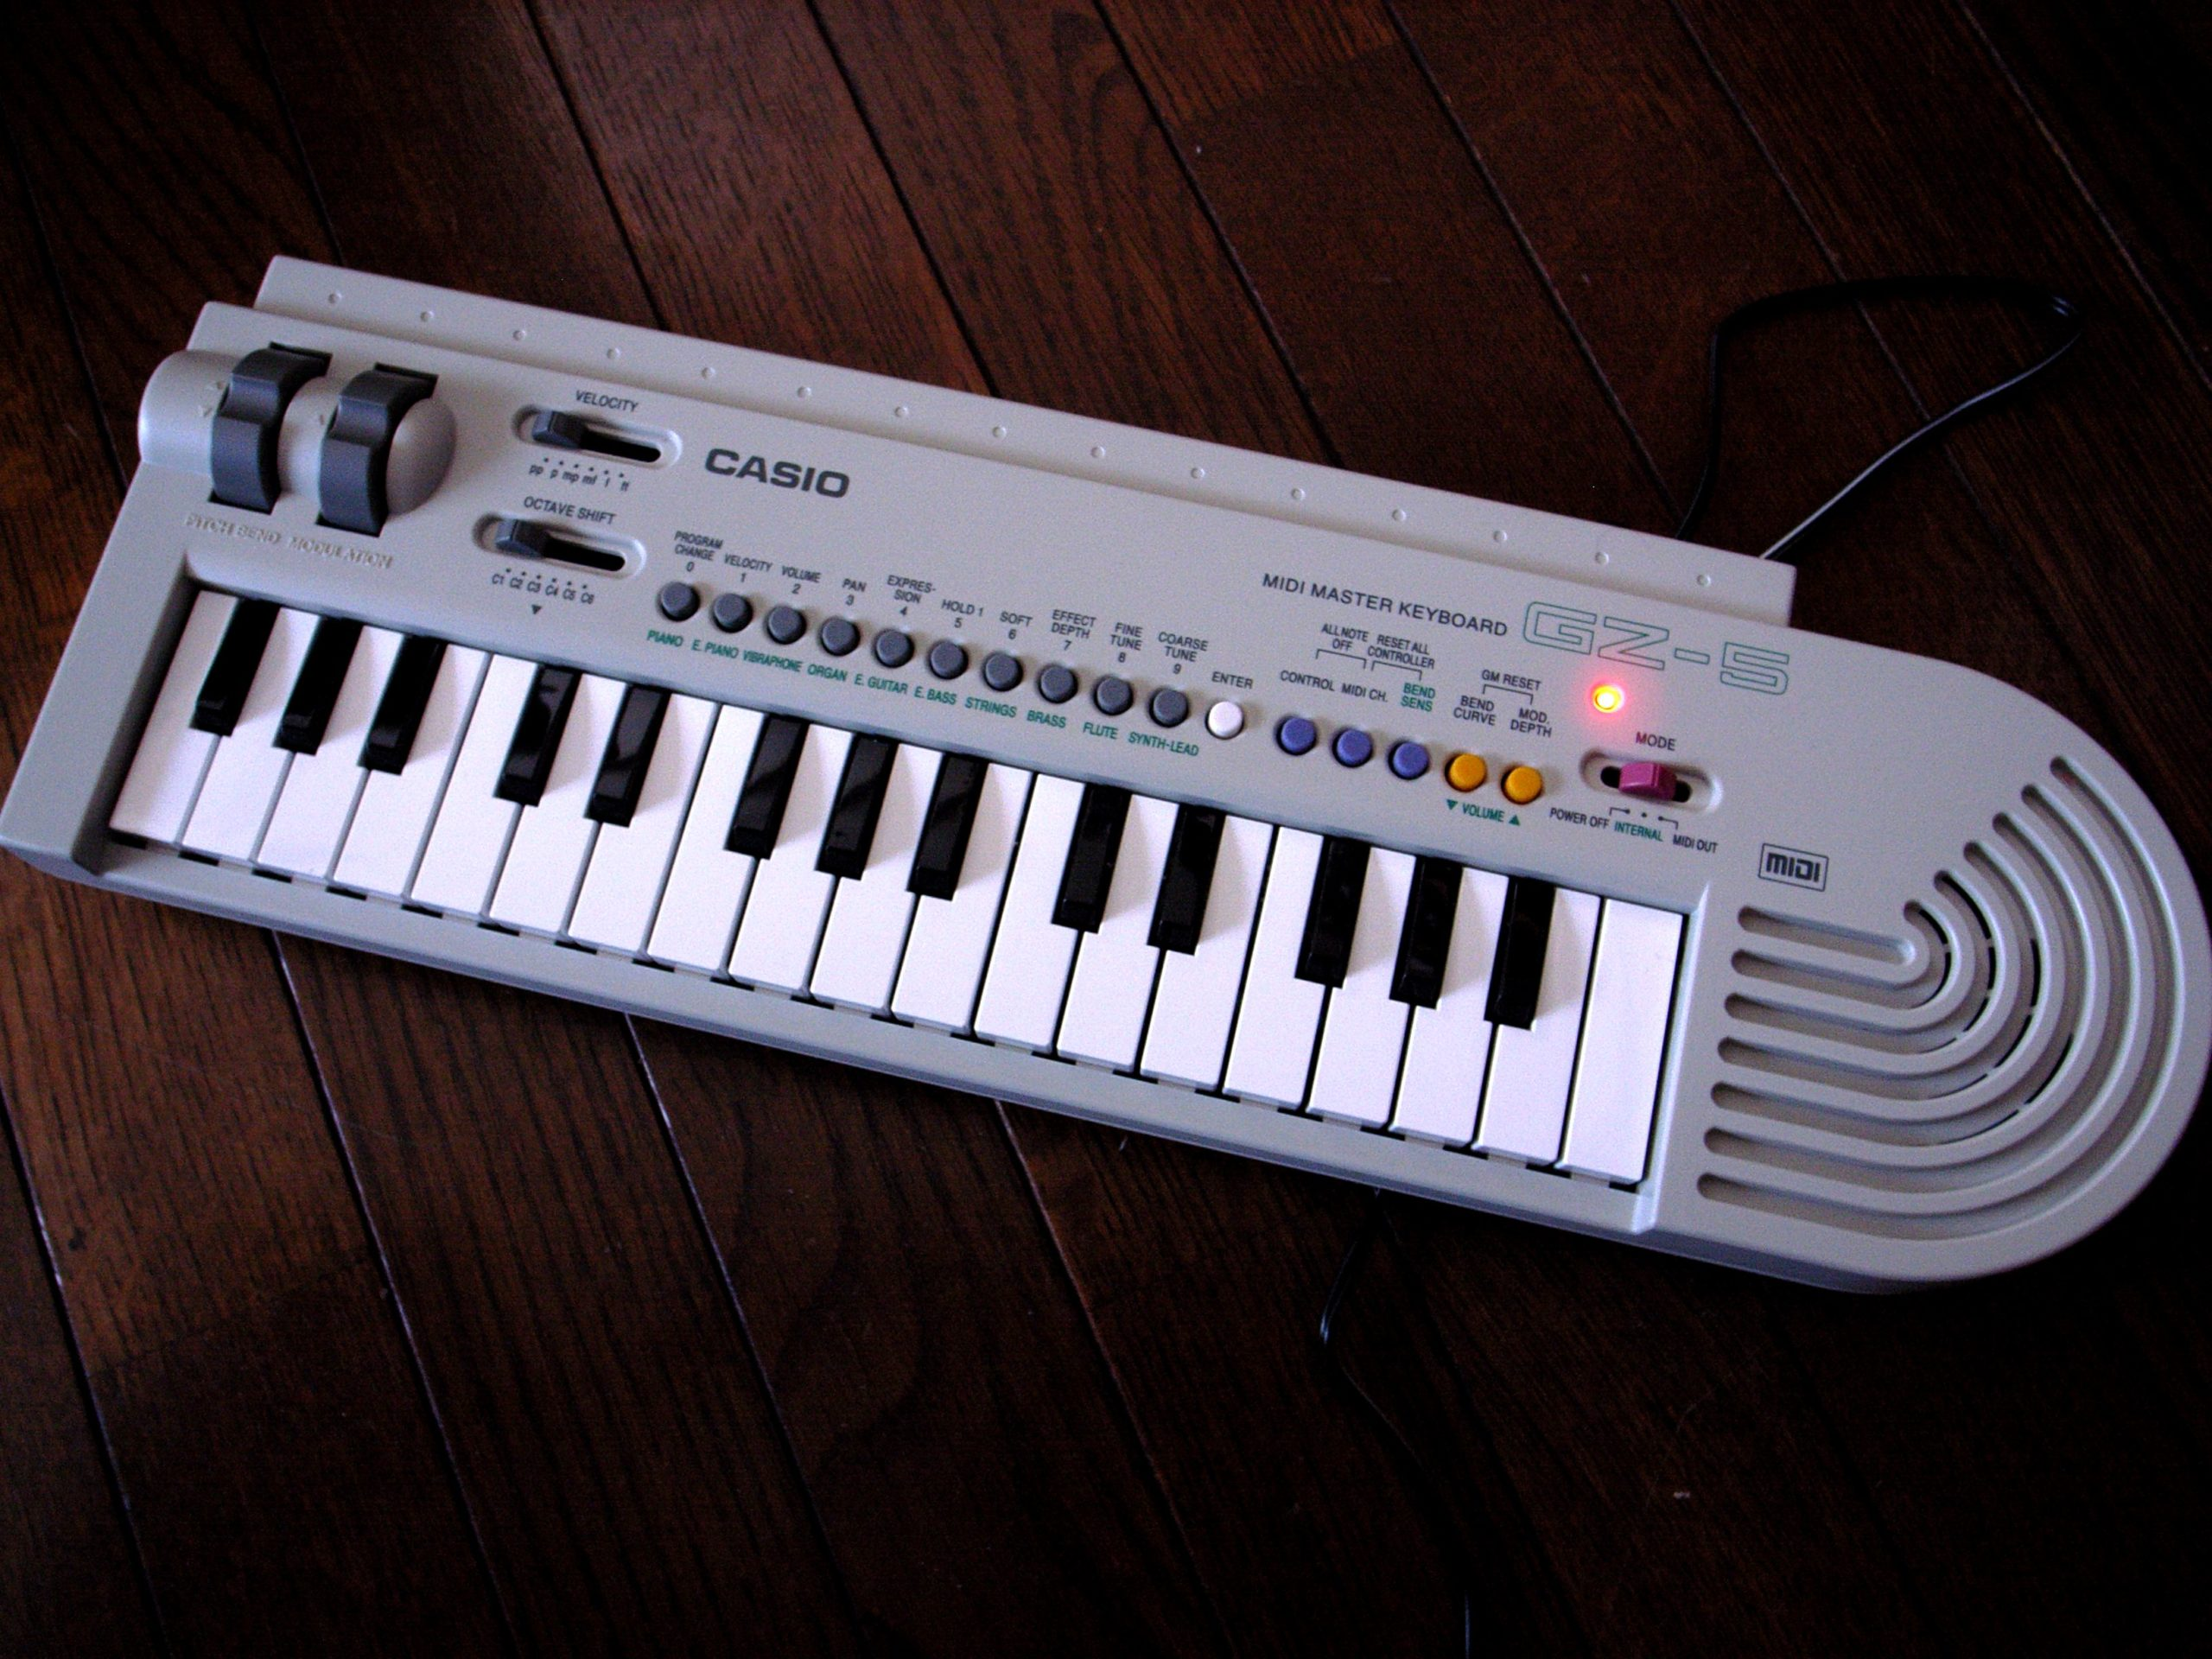 Casio Gz 5 Midi Master Keyboard Scaled